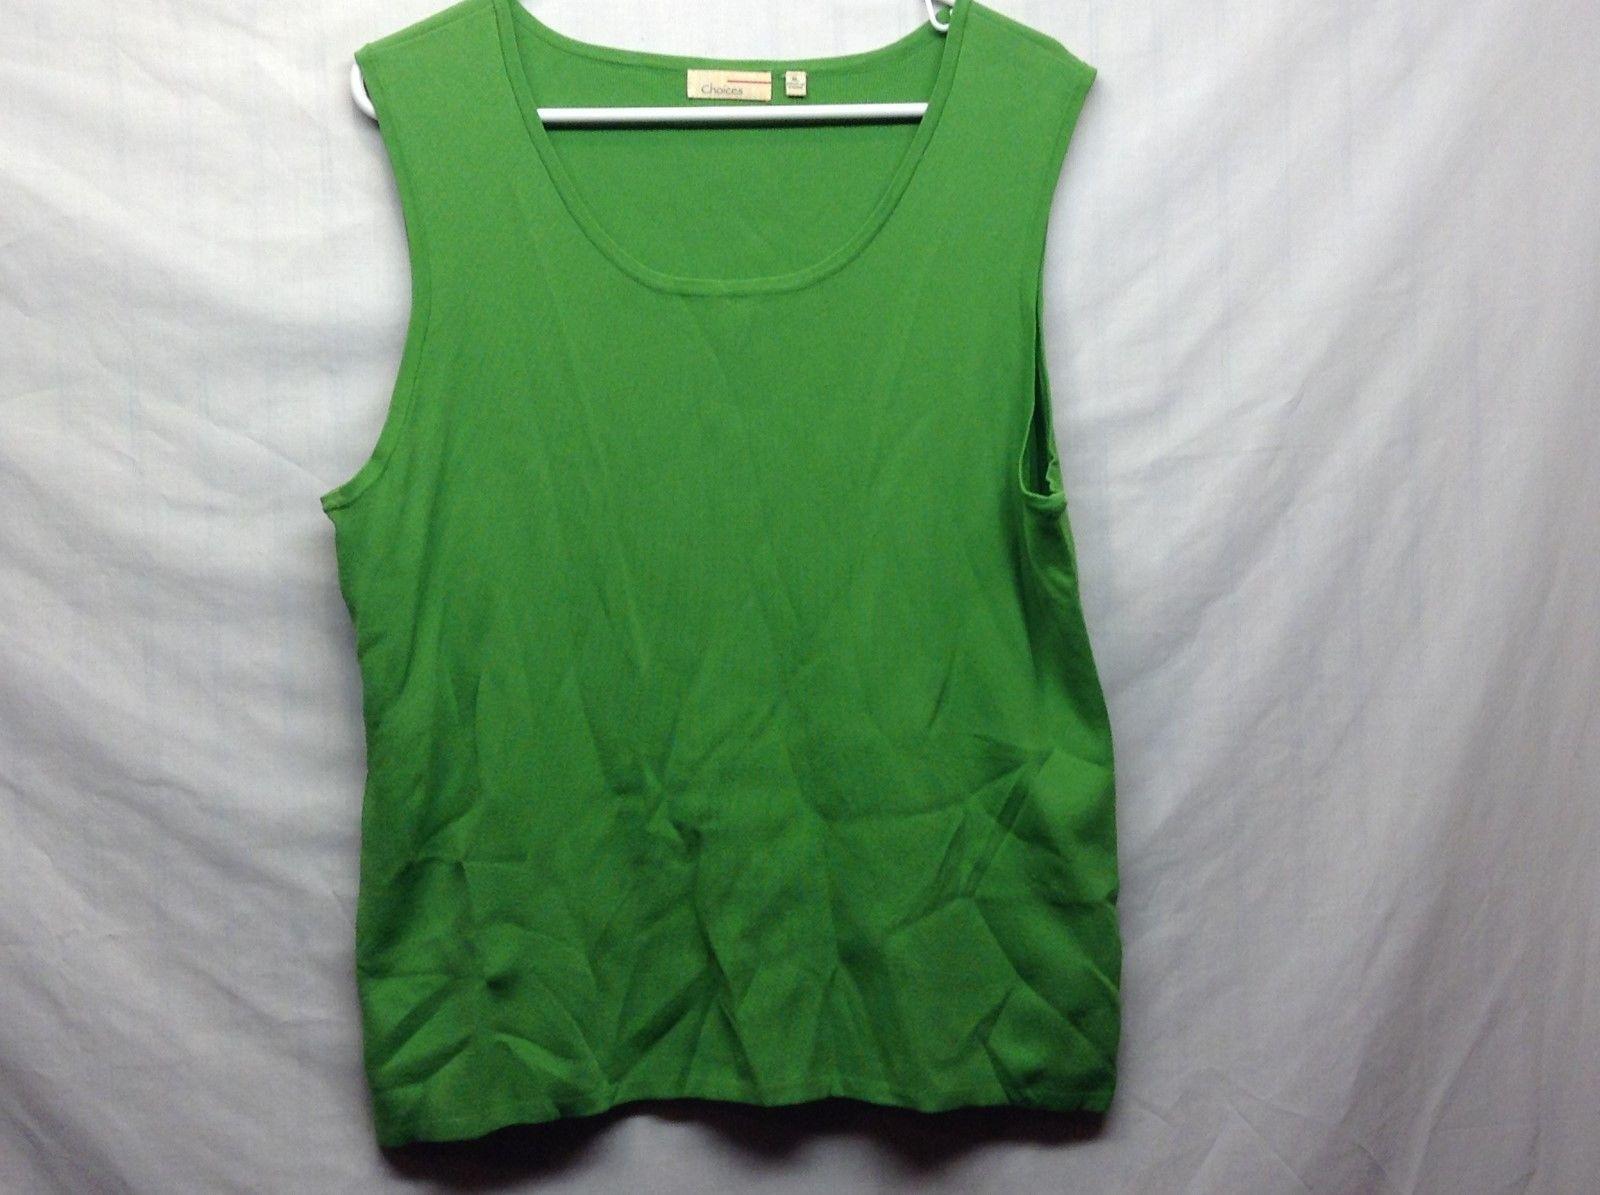 Choices Stretchy Green Tank Top Sz XL